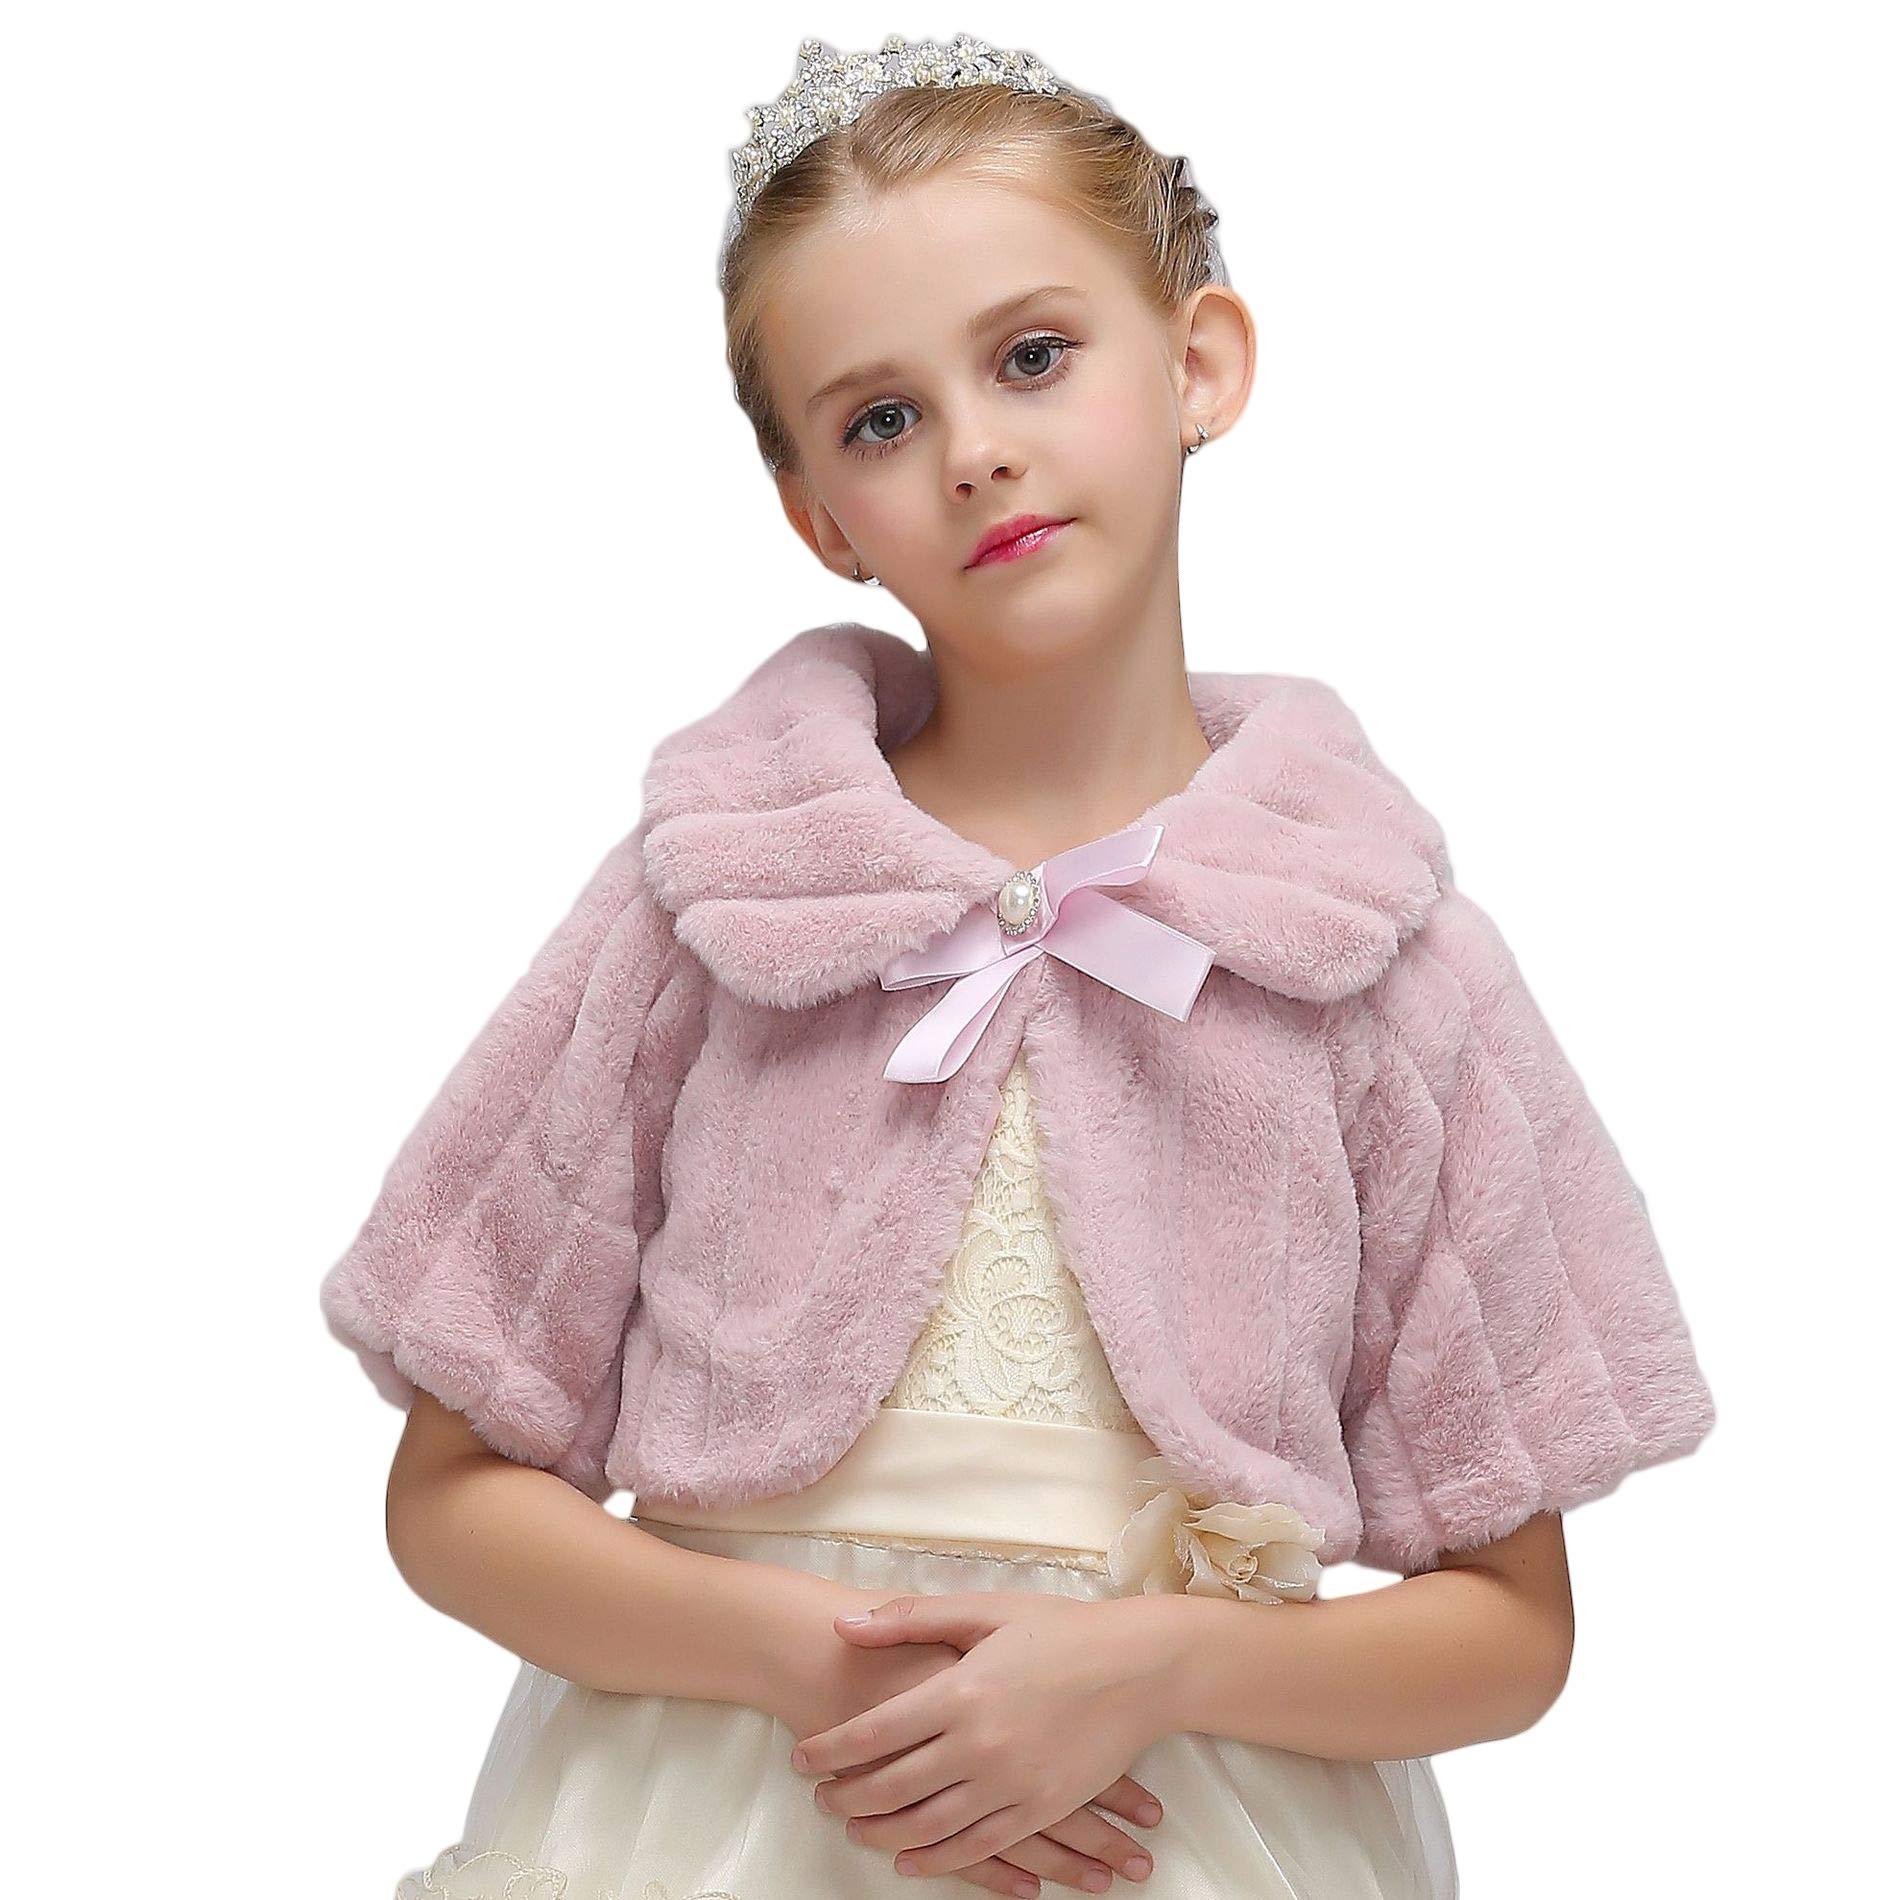 Vicokity Girls Faux Fur Winter Warm Shawls For Wedding Party Dress Girl's Princess Dress Shawl Jacket (Nude Pink, XXXL)